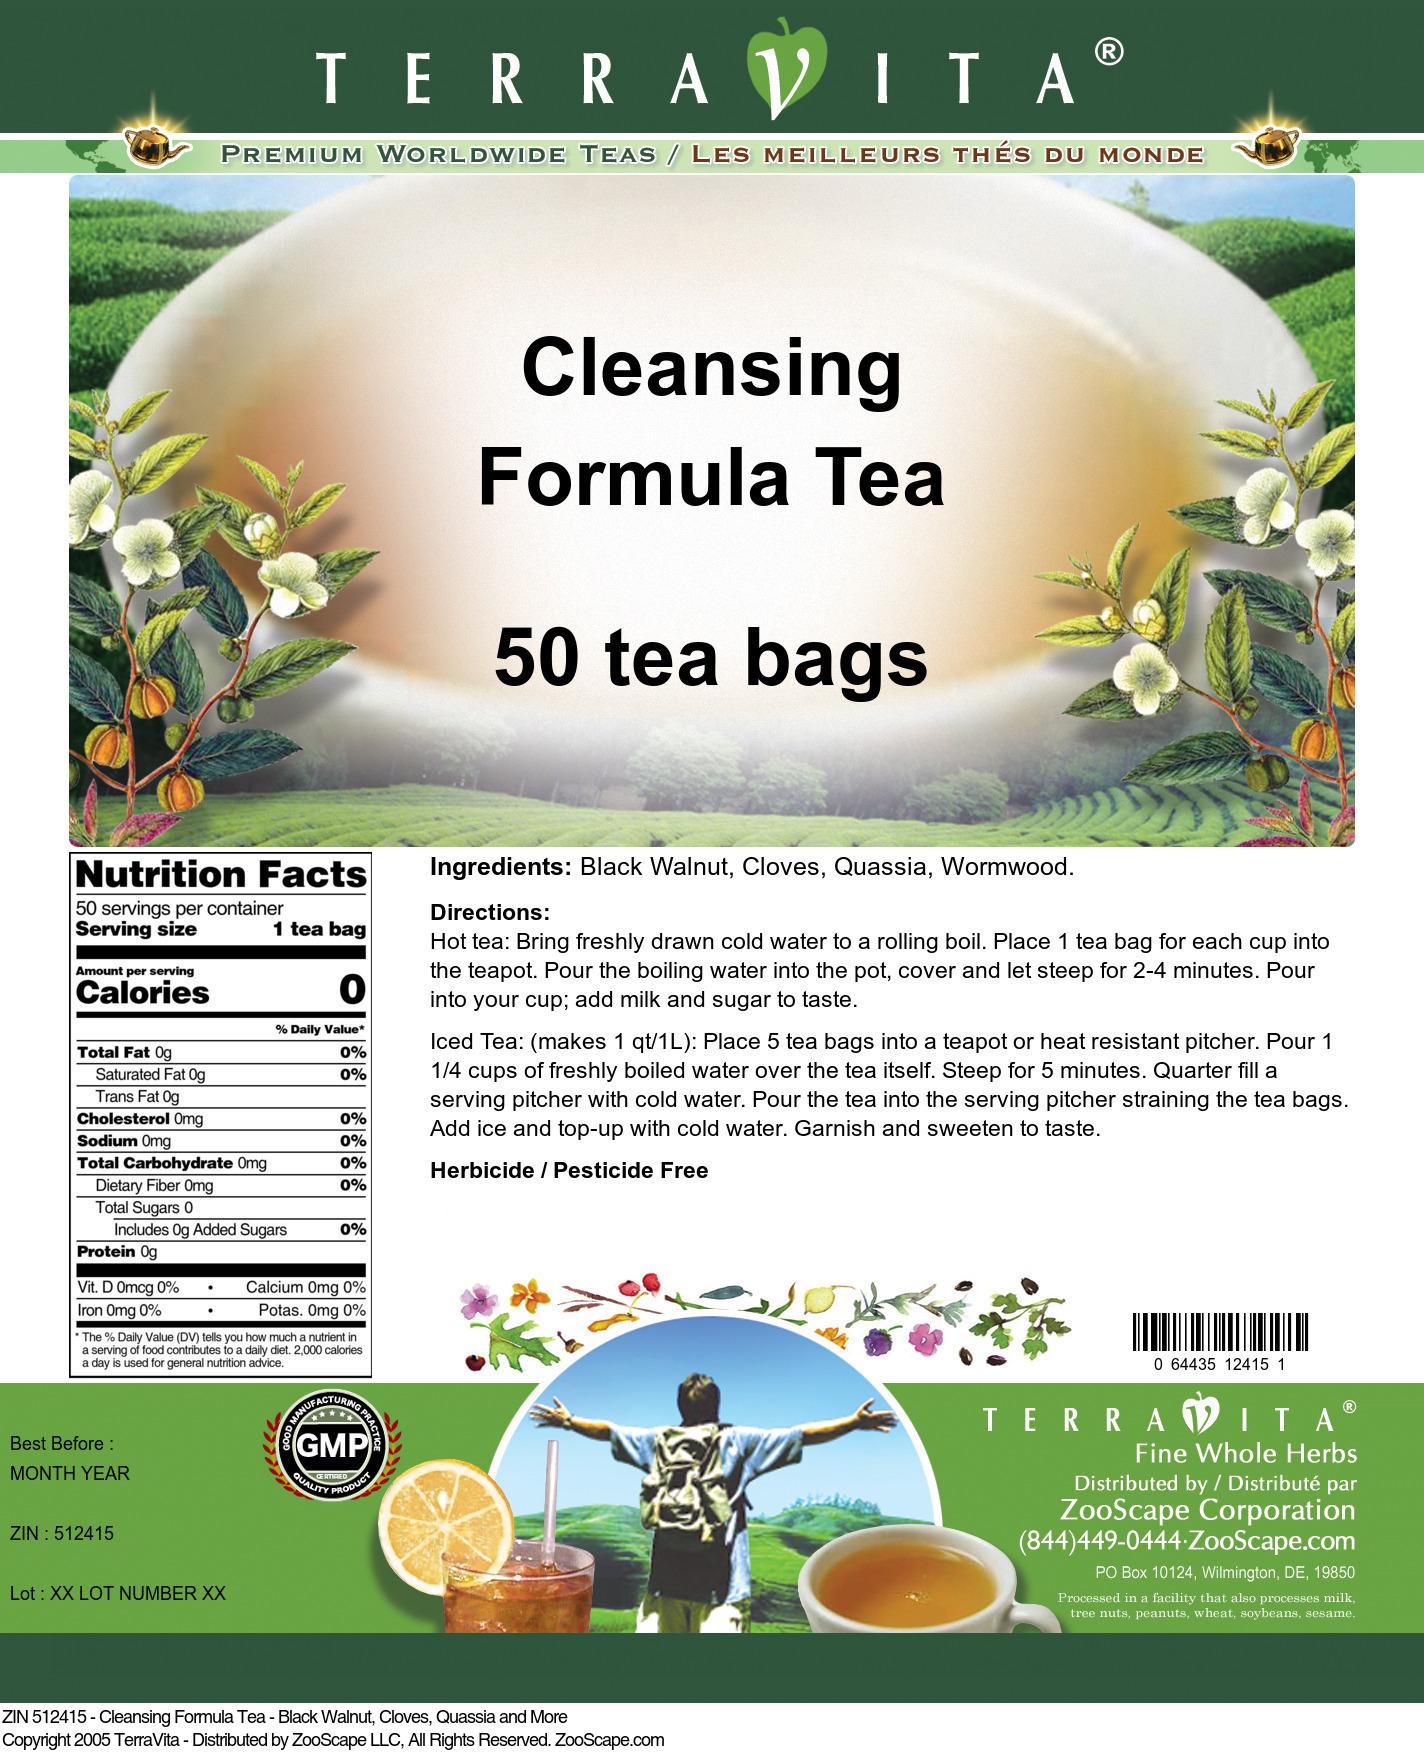 Cleansing Formula Tea - Black Walnut, Cloves, Quassia and More